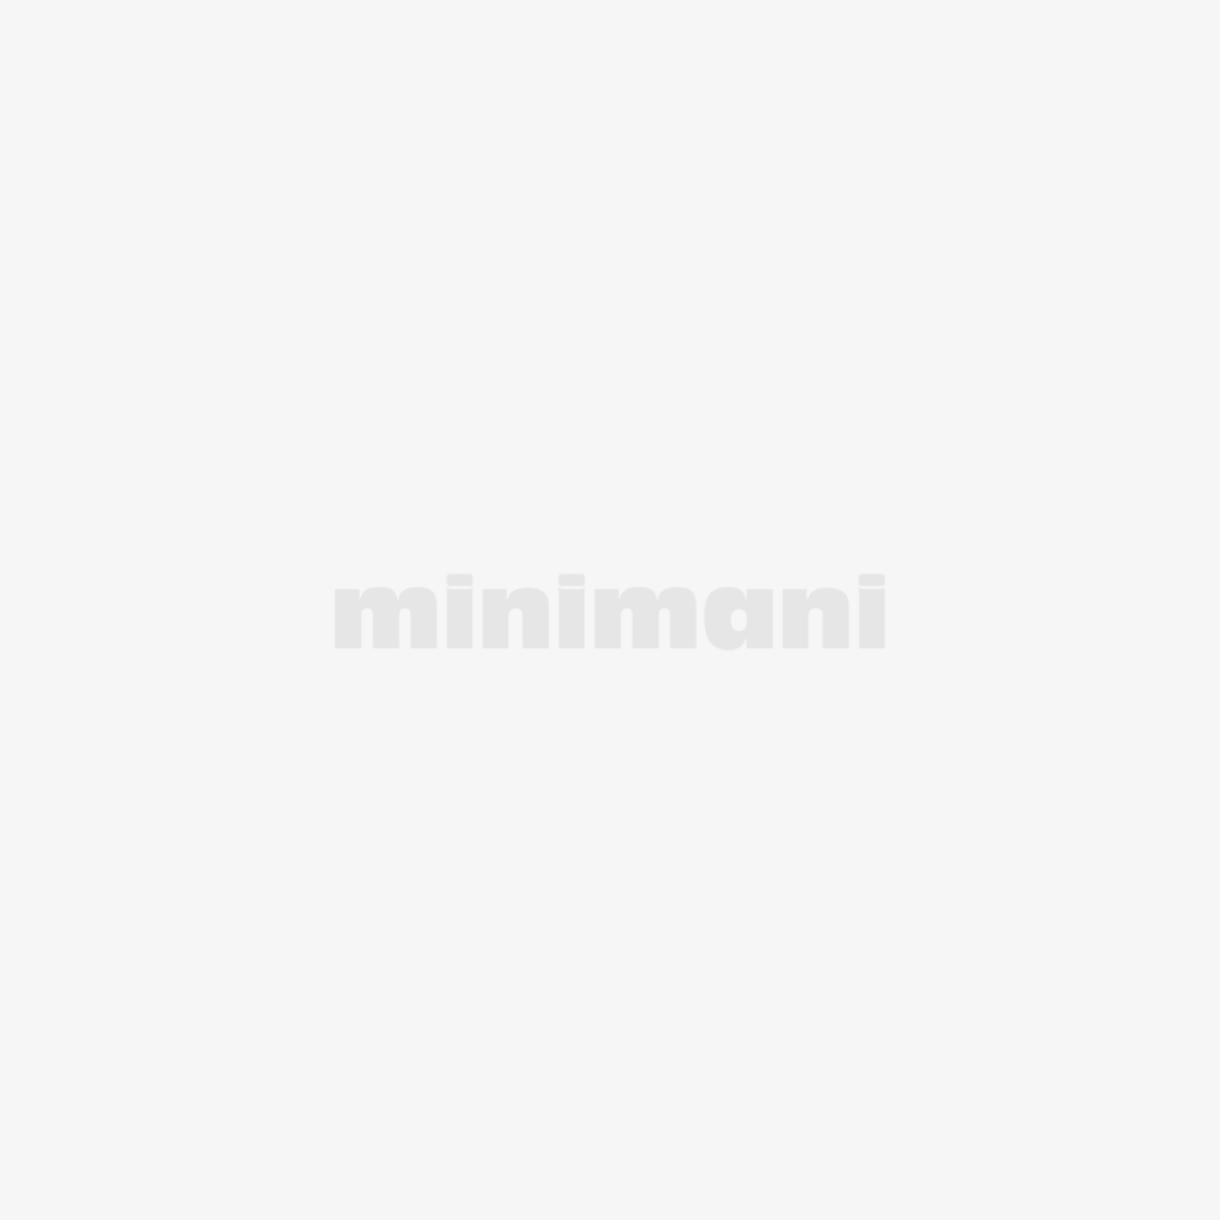 EXTREME-MATTO 55 X 190/3MM